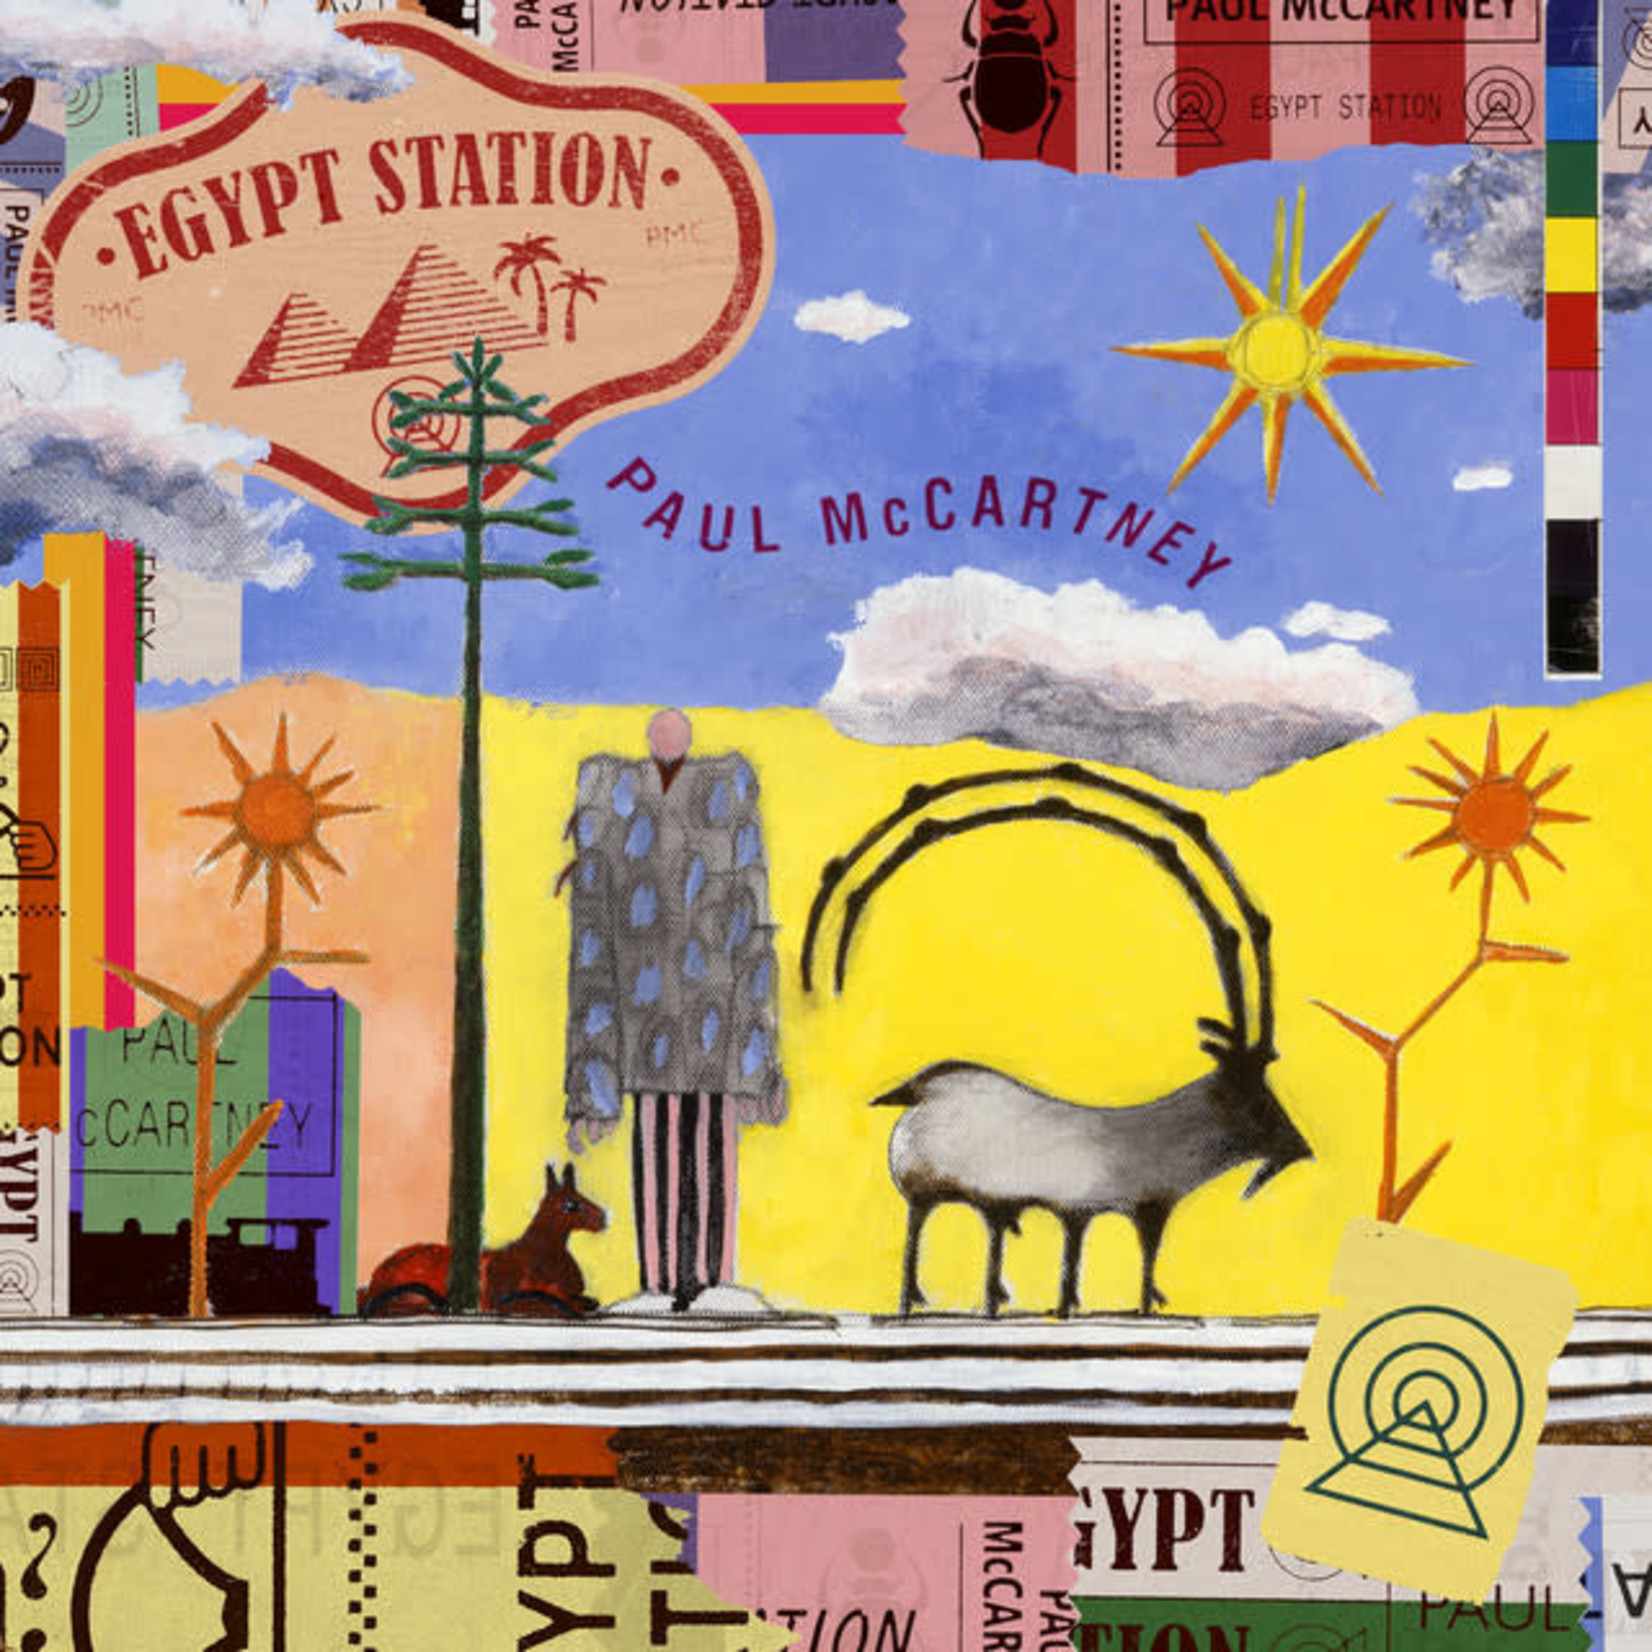 Compact Disc Paul McCartney - Egypt Station (CD)